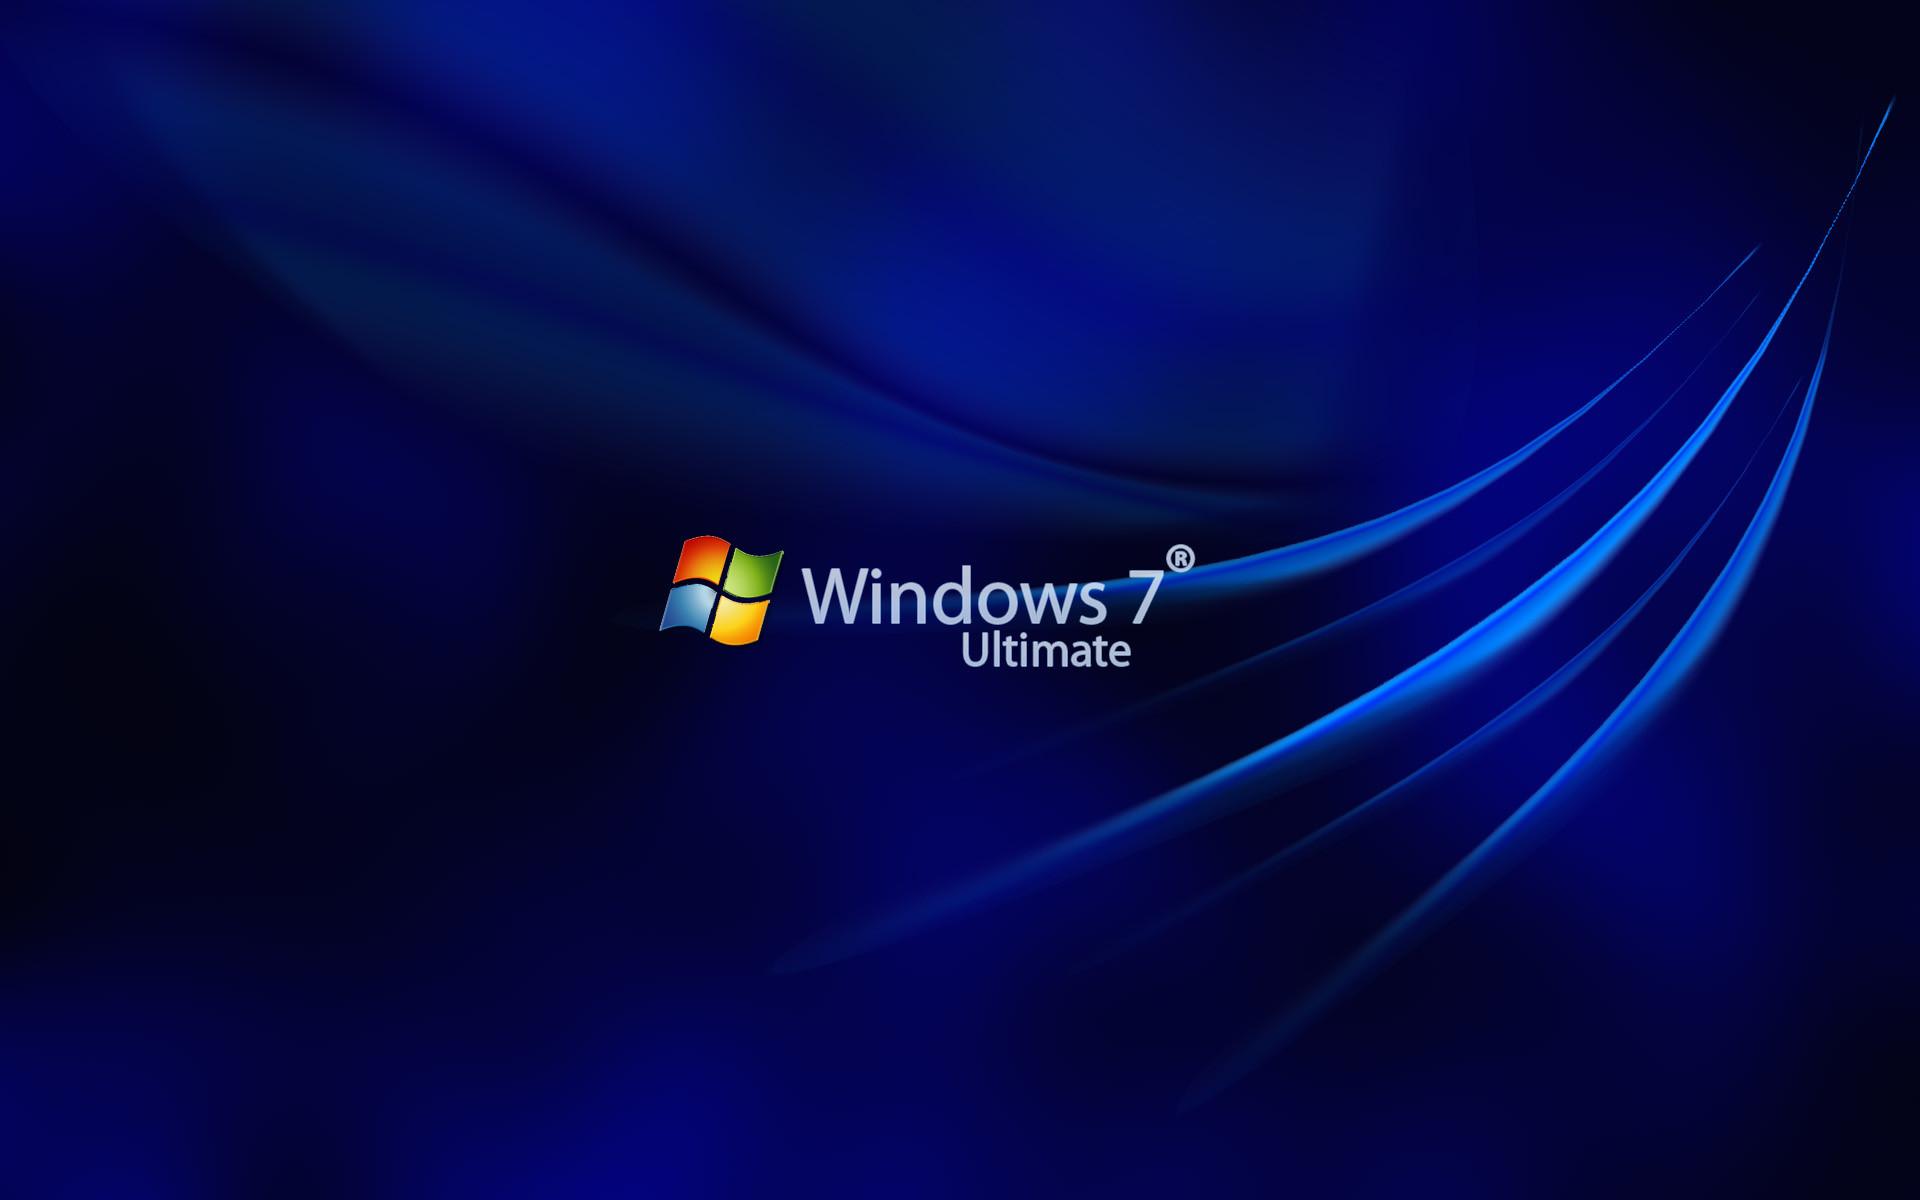 My Best Wallpapers Windows 7 Blue Wallpaper Hd 1920x1200 Wallpaper Teahub Io